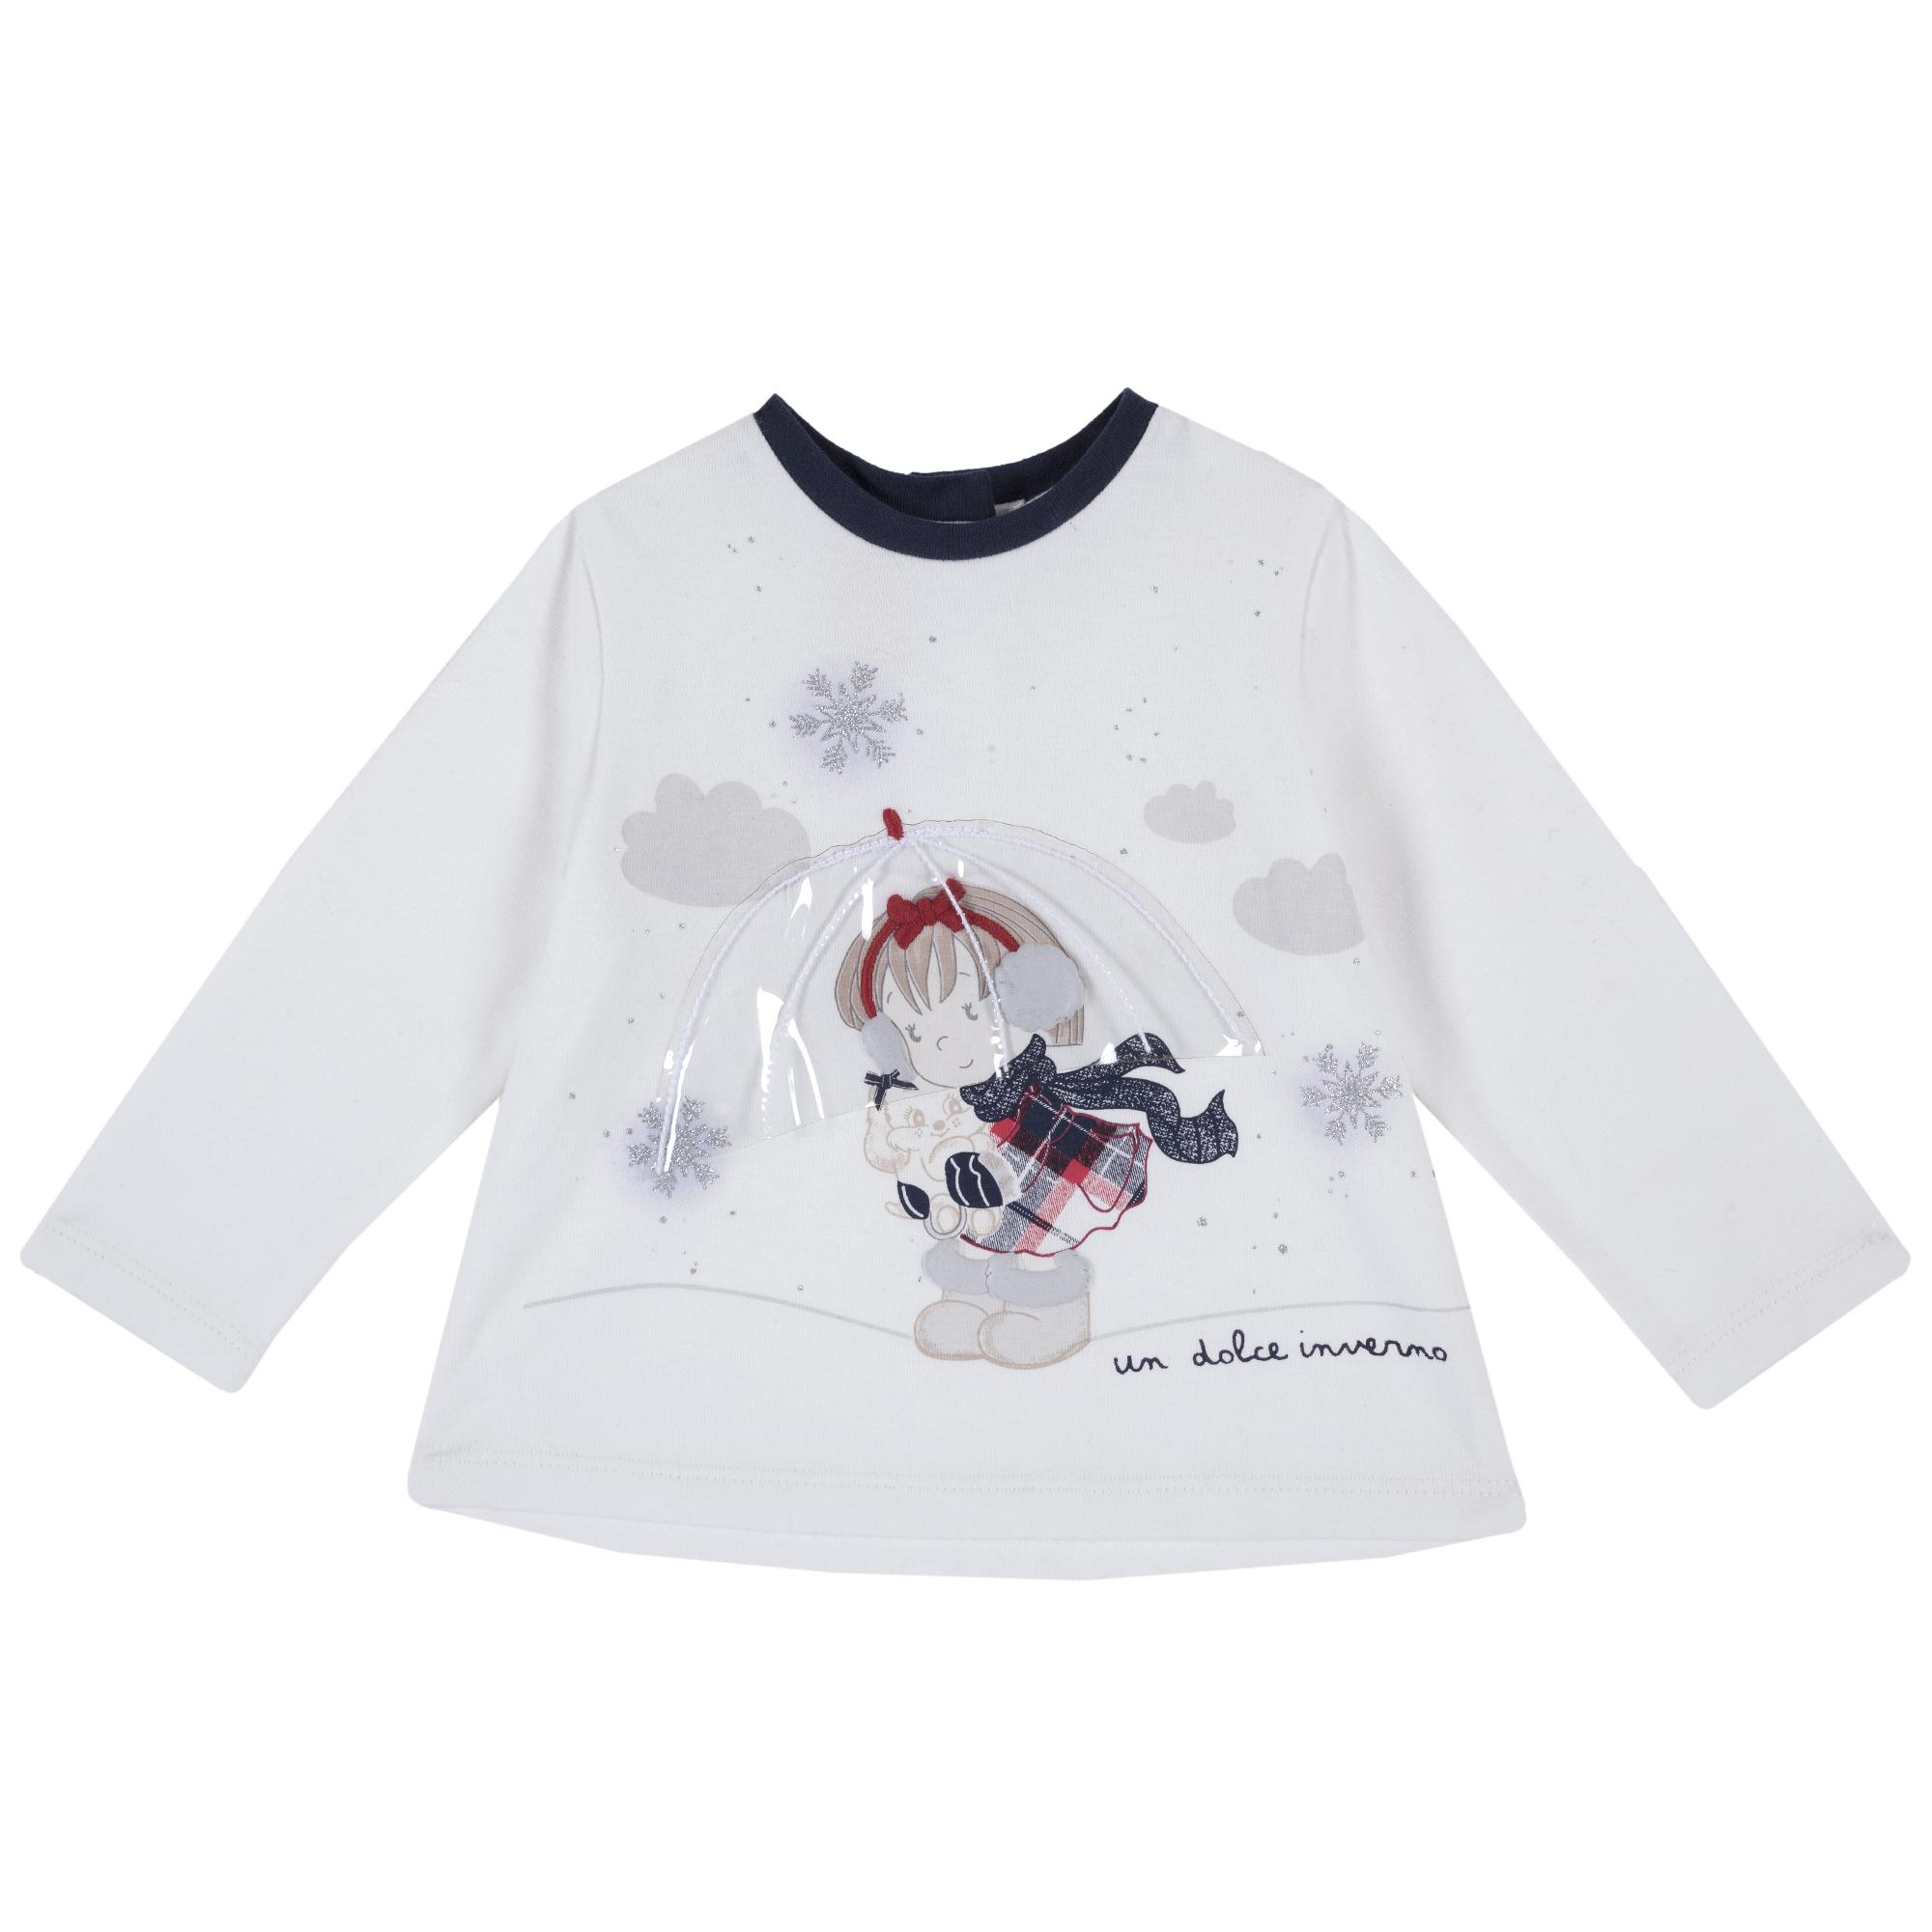 Tricou Copii Din Jerse Chicco, Maneca Lunga, Alb, 06789 imagine